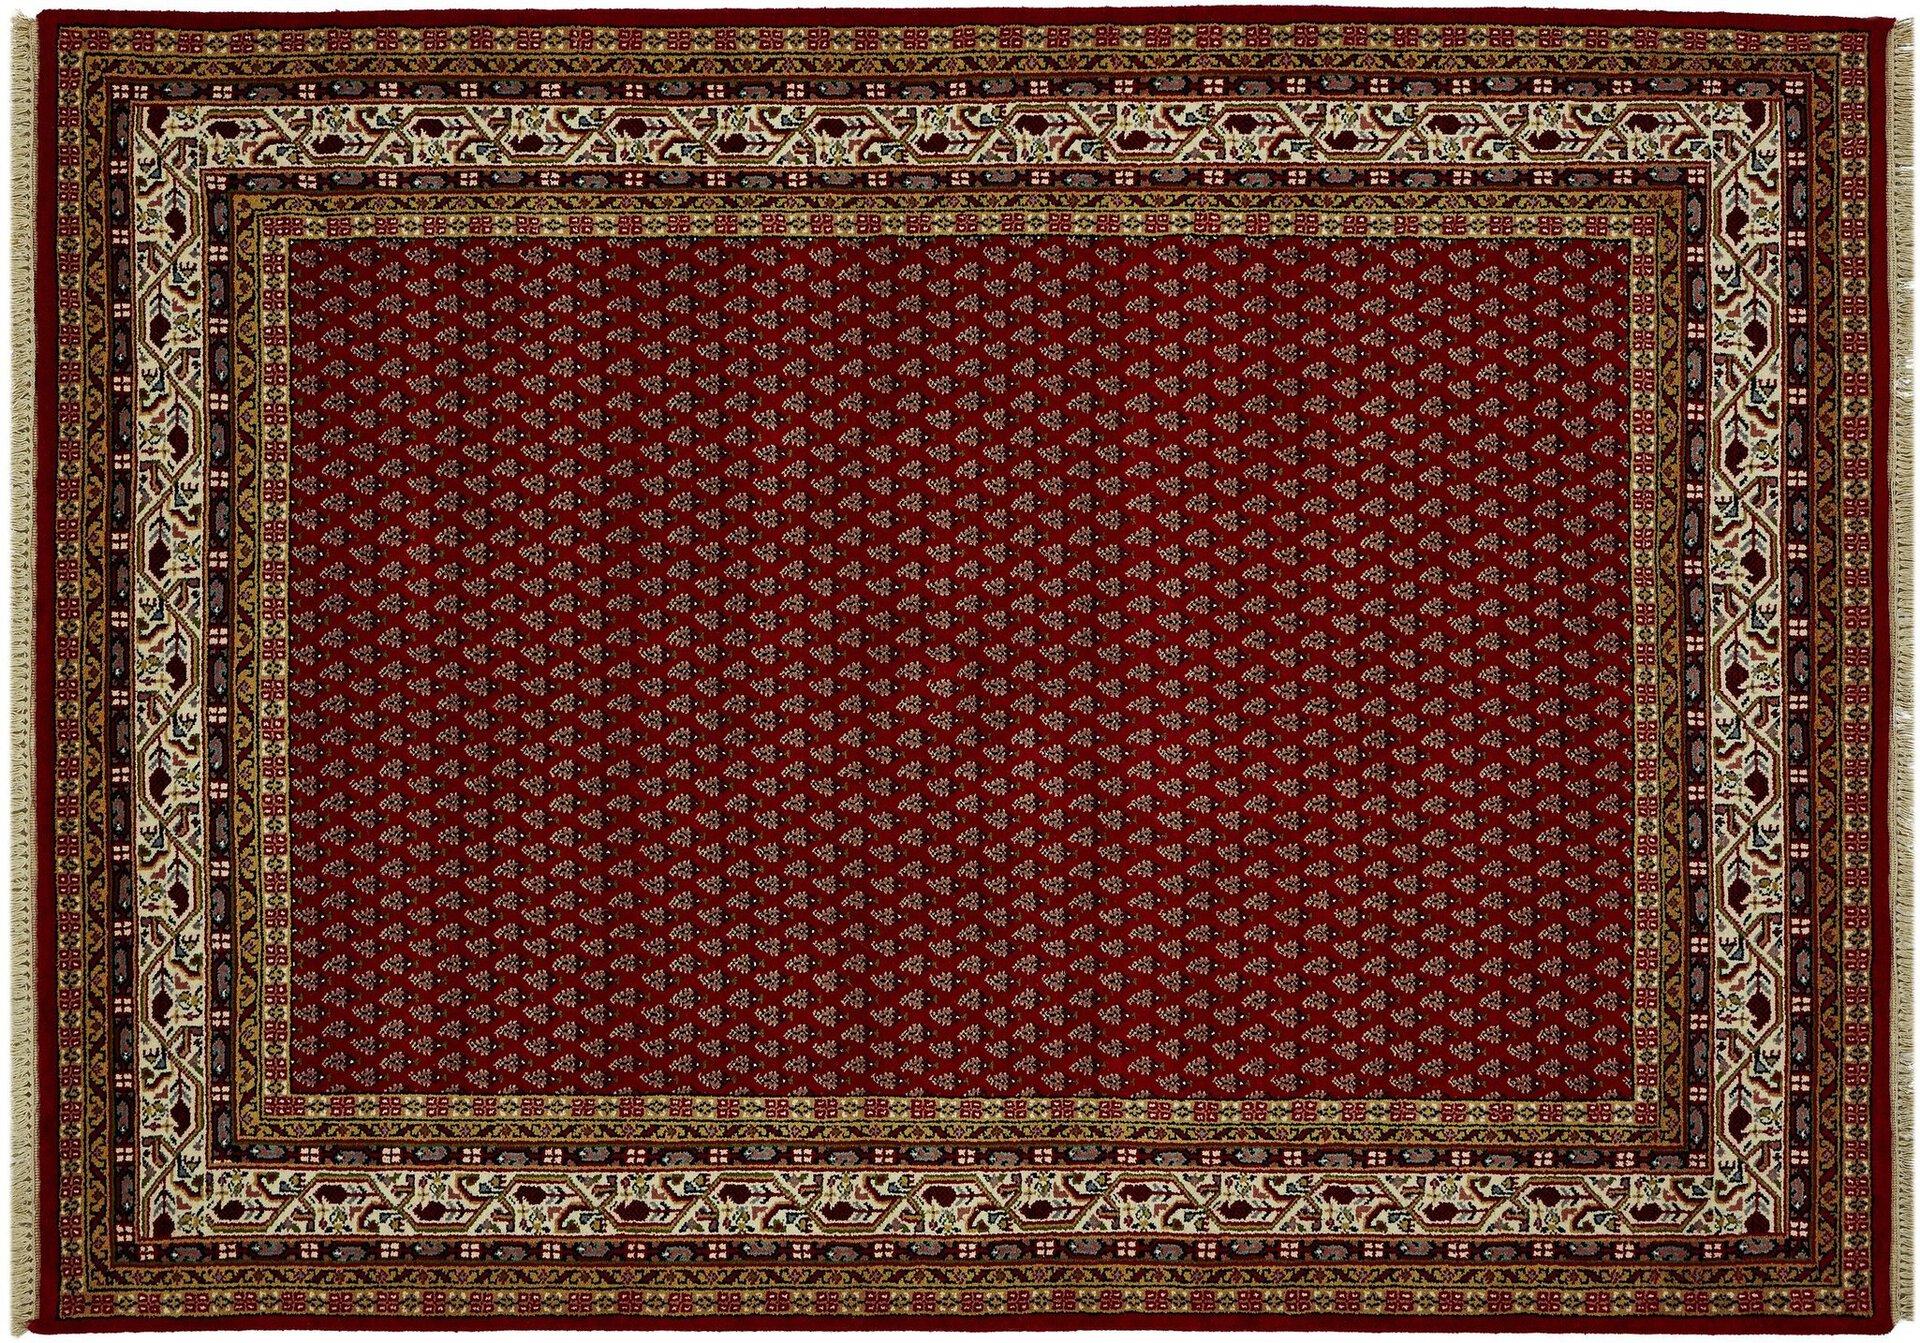 Orientteppich Bikaner Mir Rug Studios Textil rot 1 x 1 cm